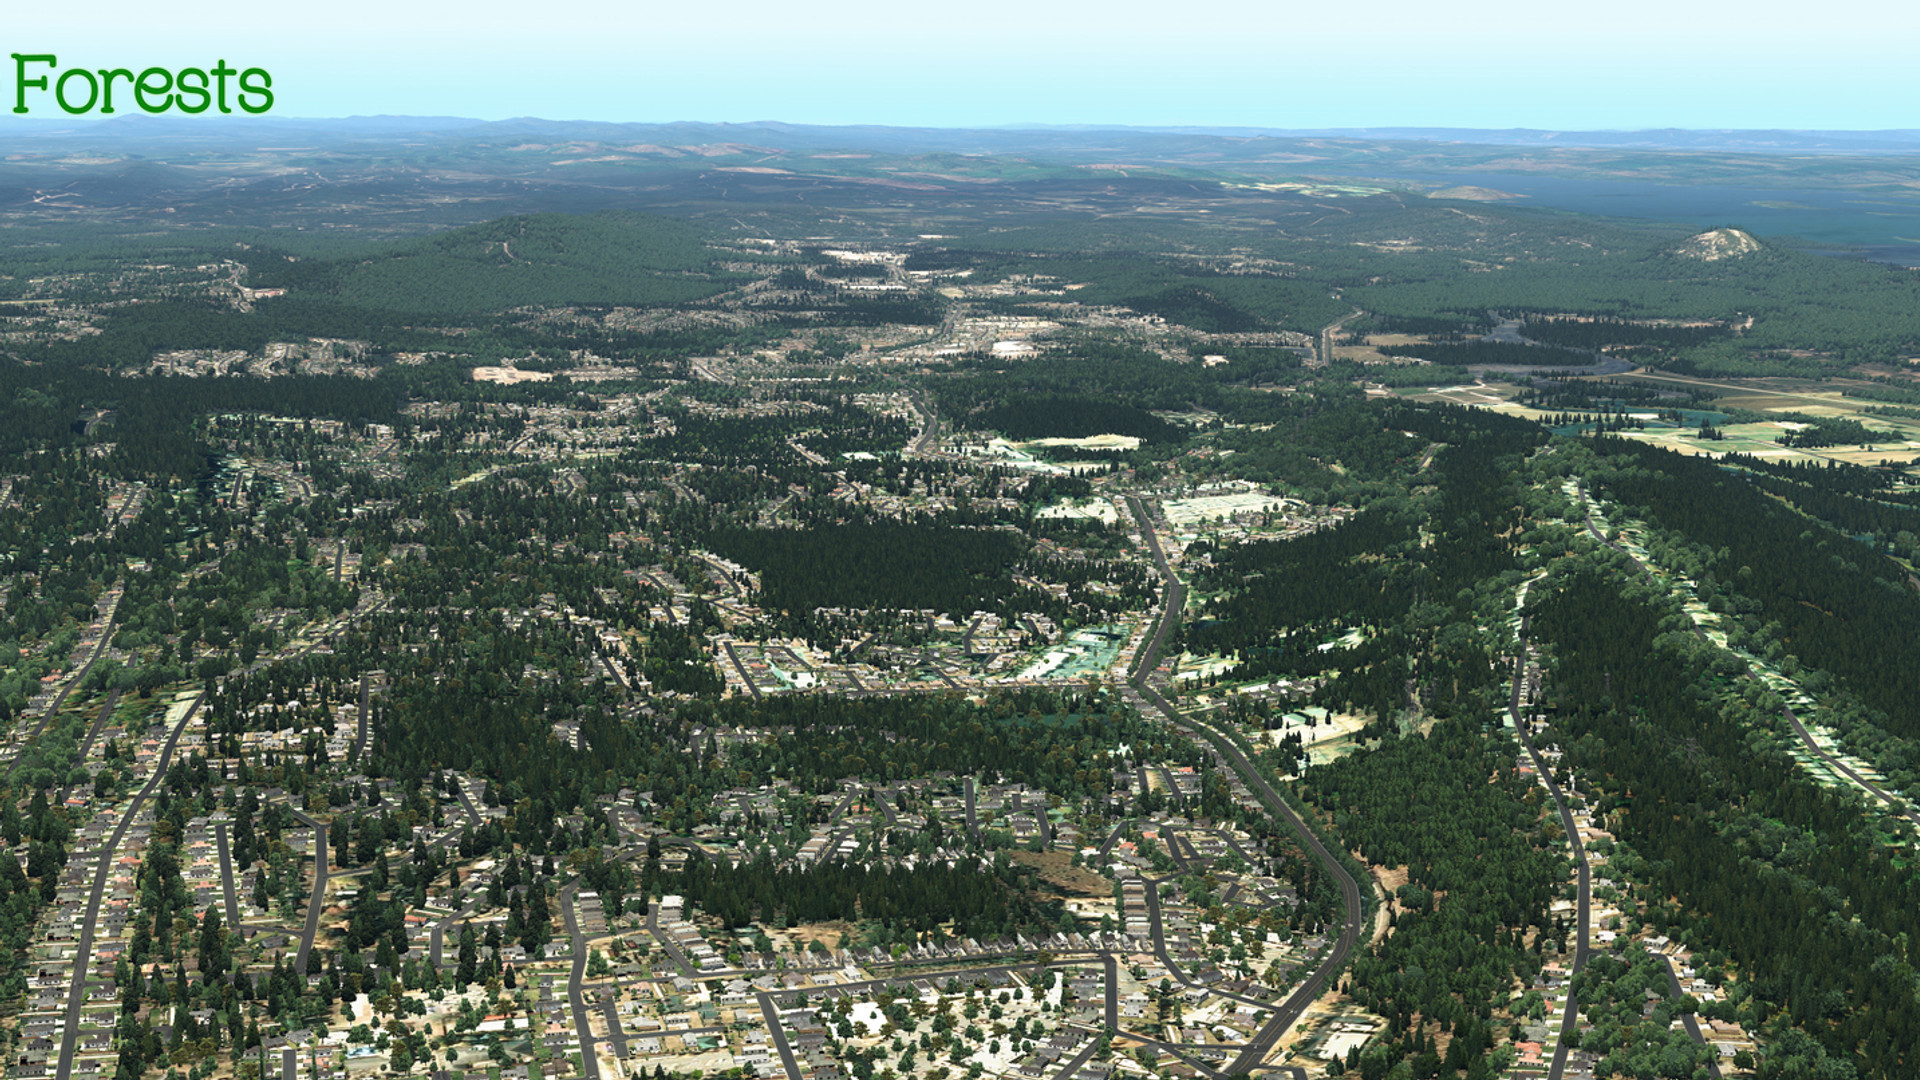 Global_Forests_USA6.jpg